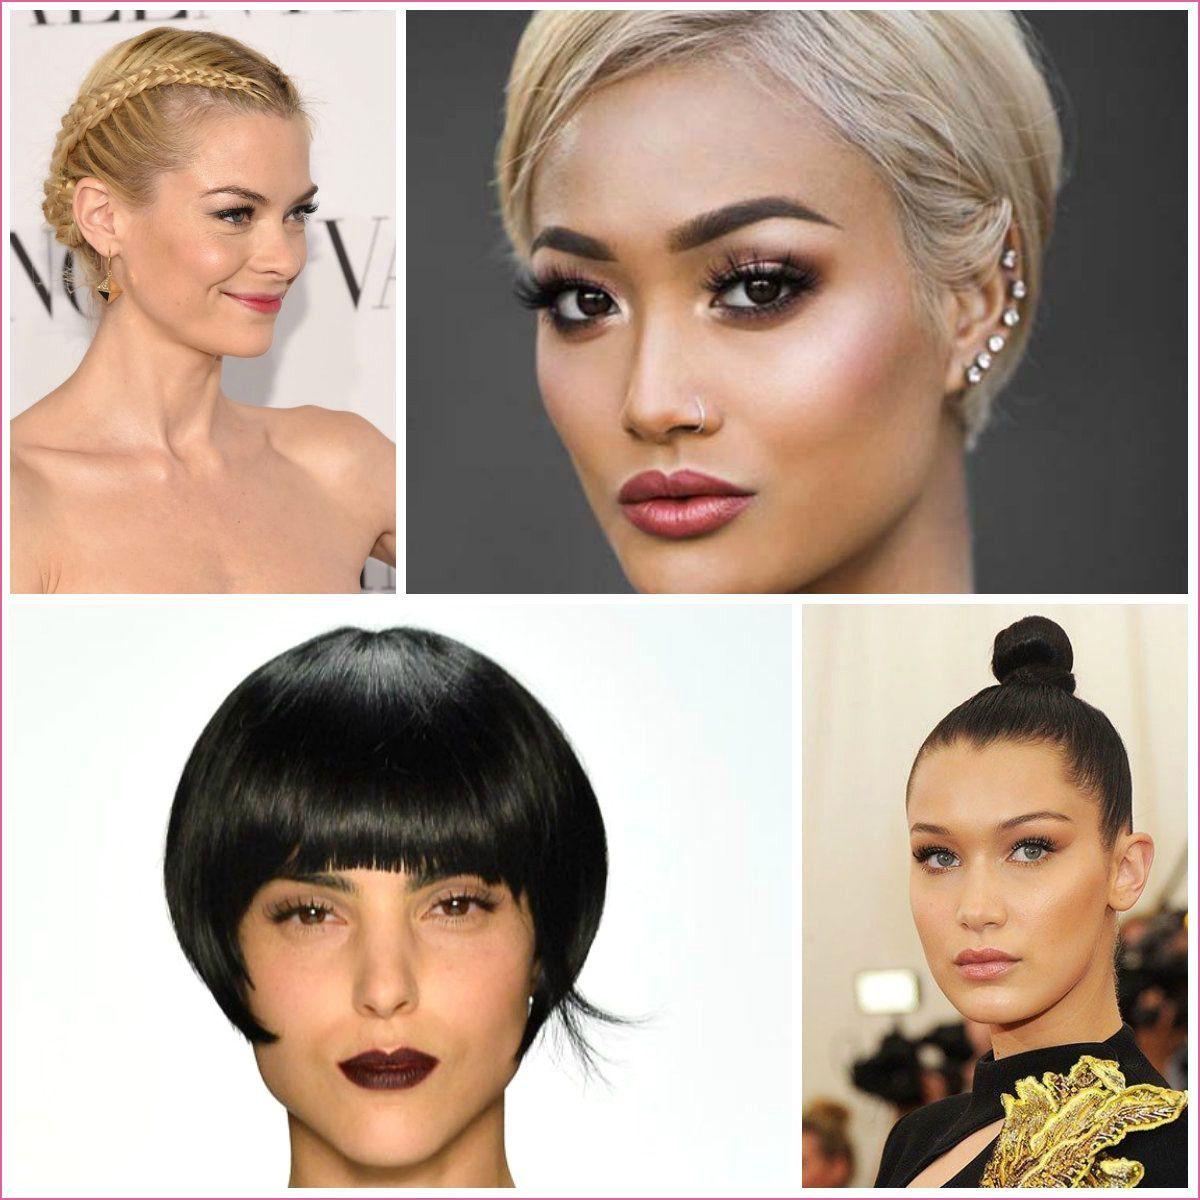 Valentina Pahde Neue Frisur Sleek Hairstyles Short Hair Styles Hair Styles